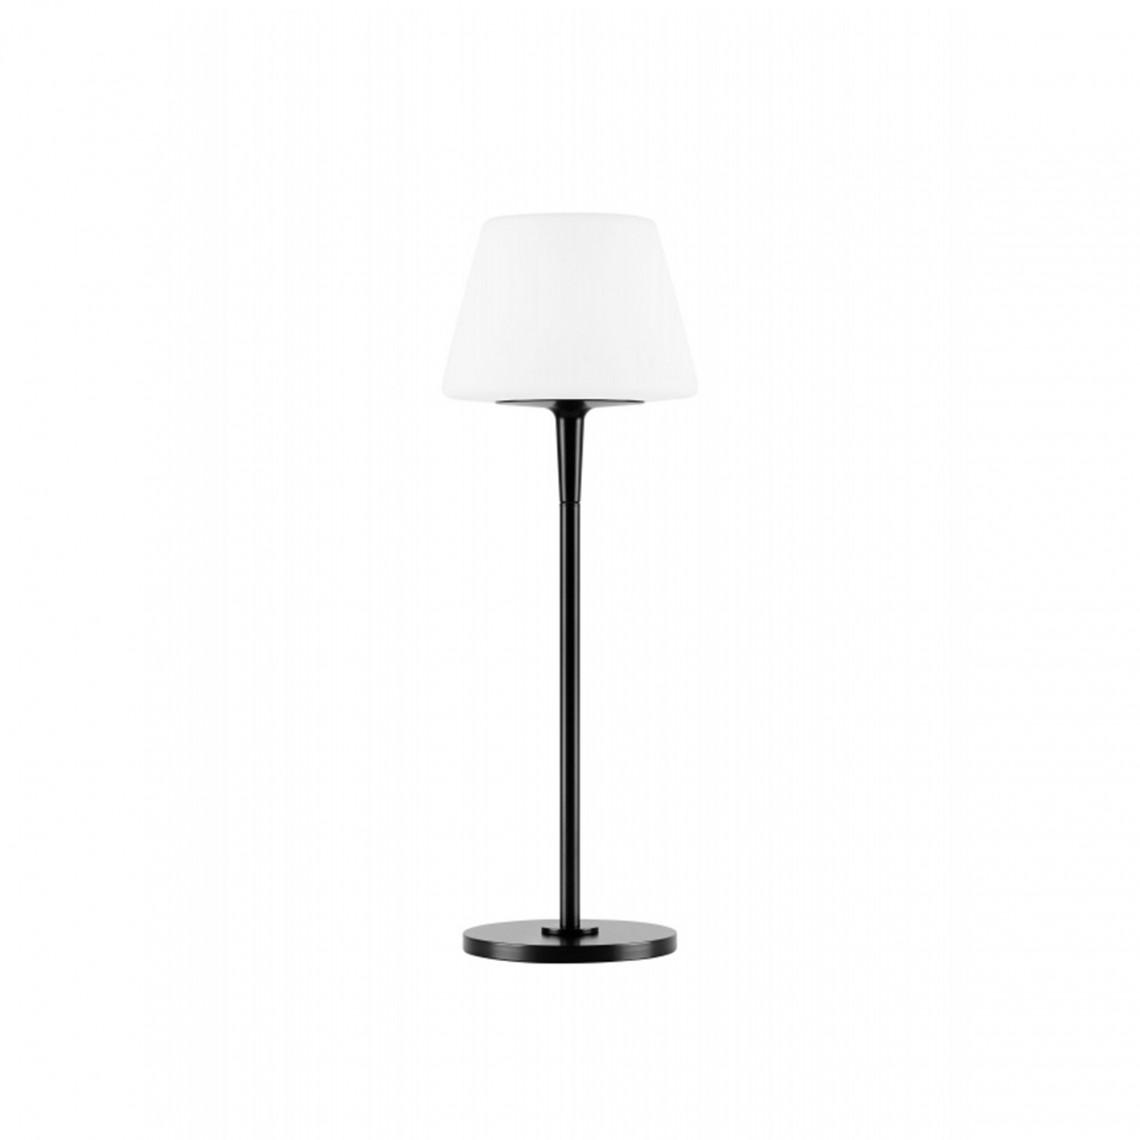 Riff - Bordslampa Cone Svart